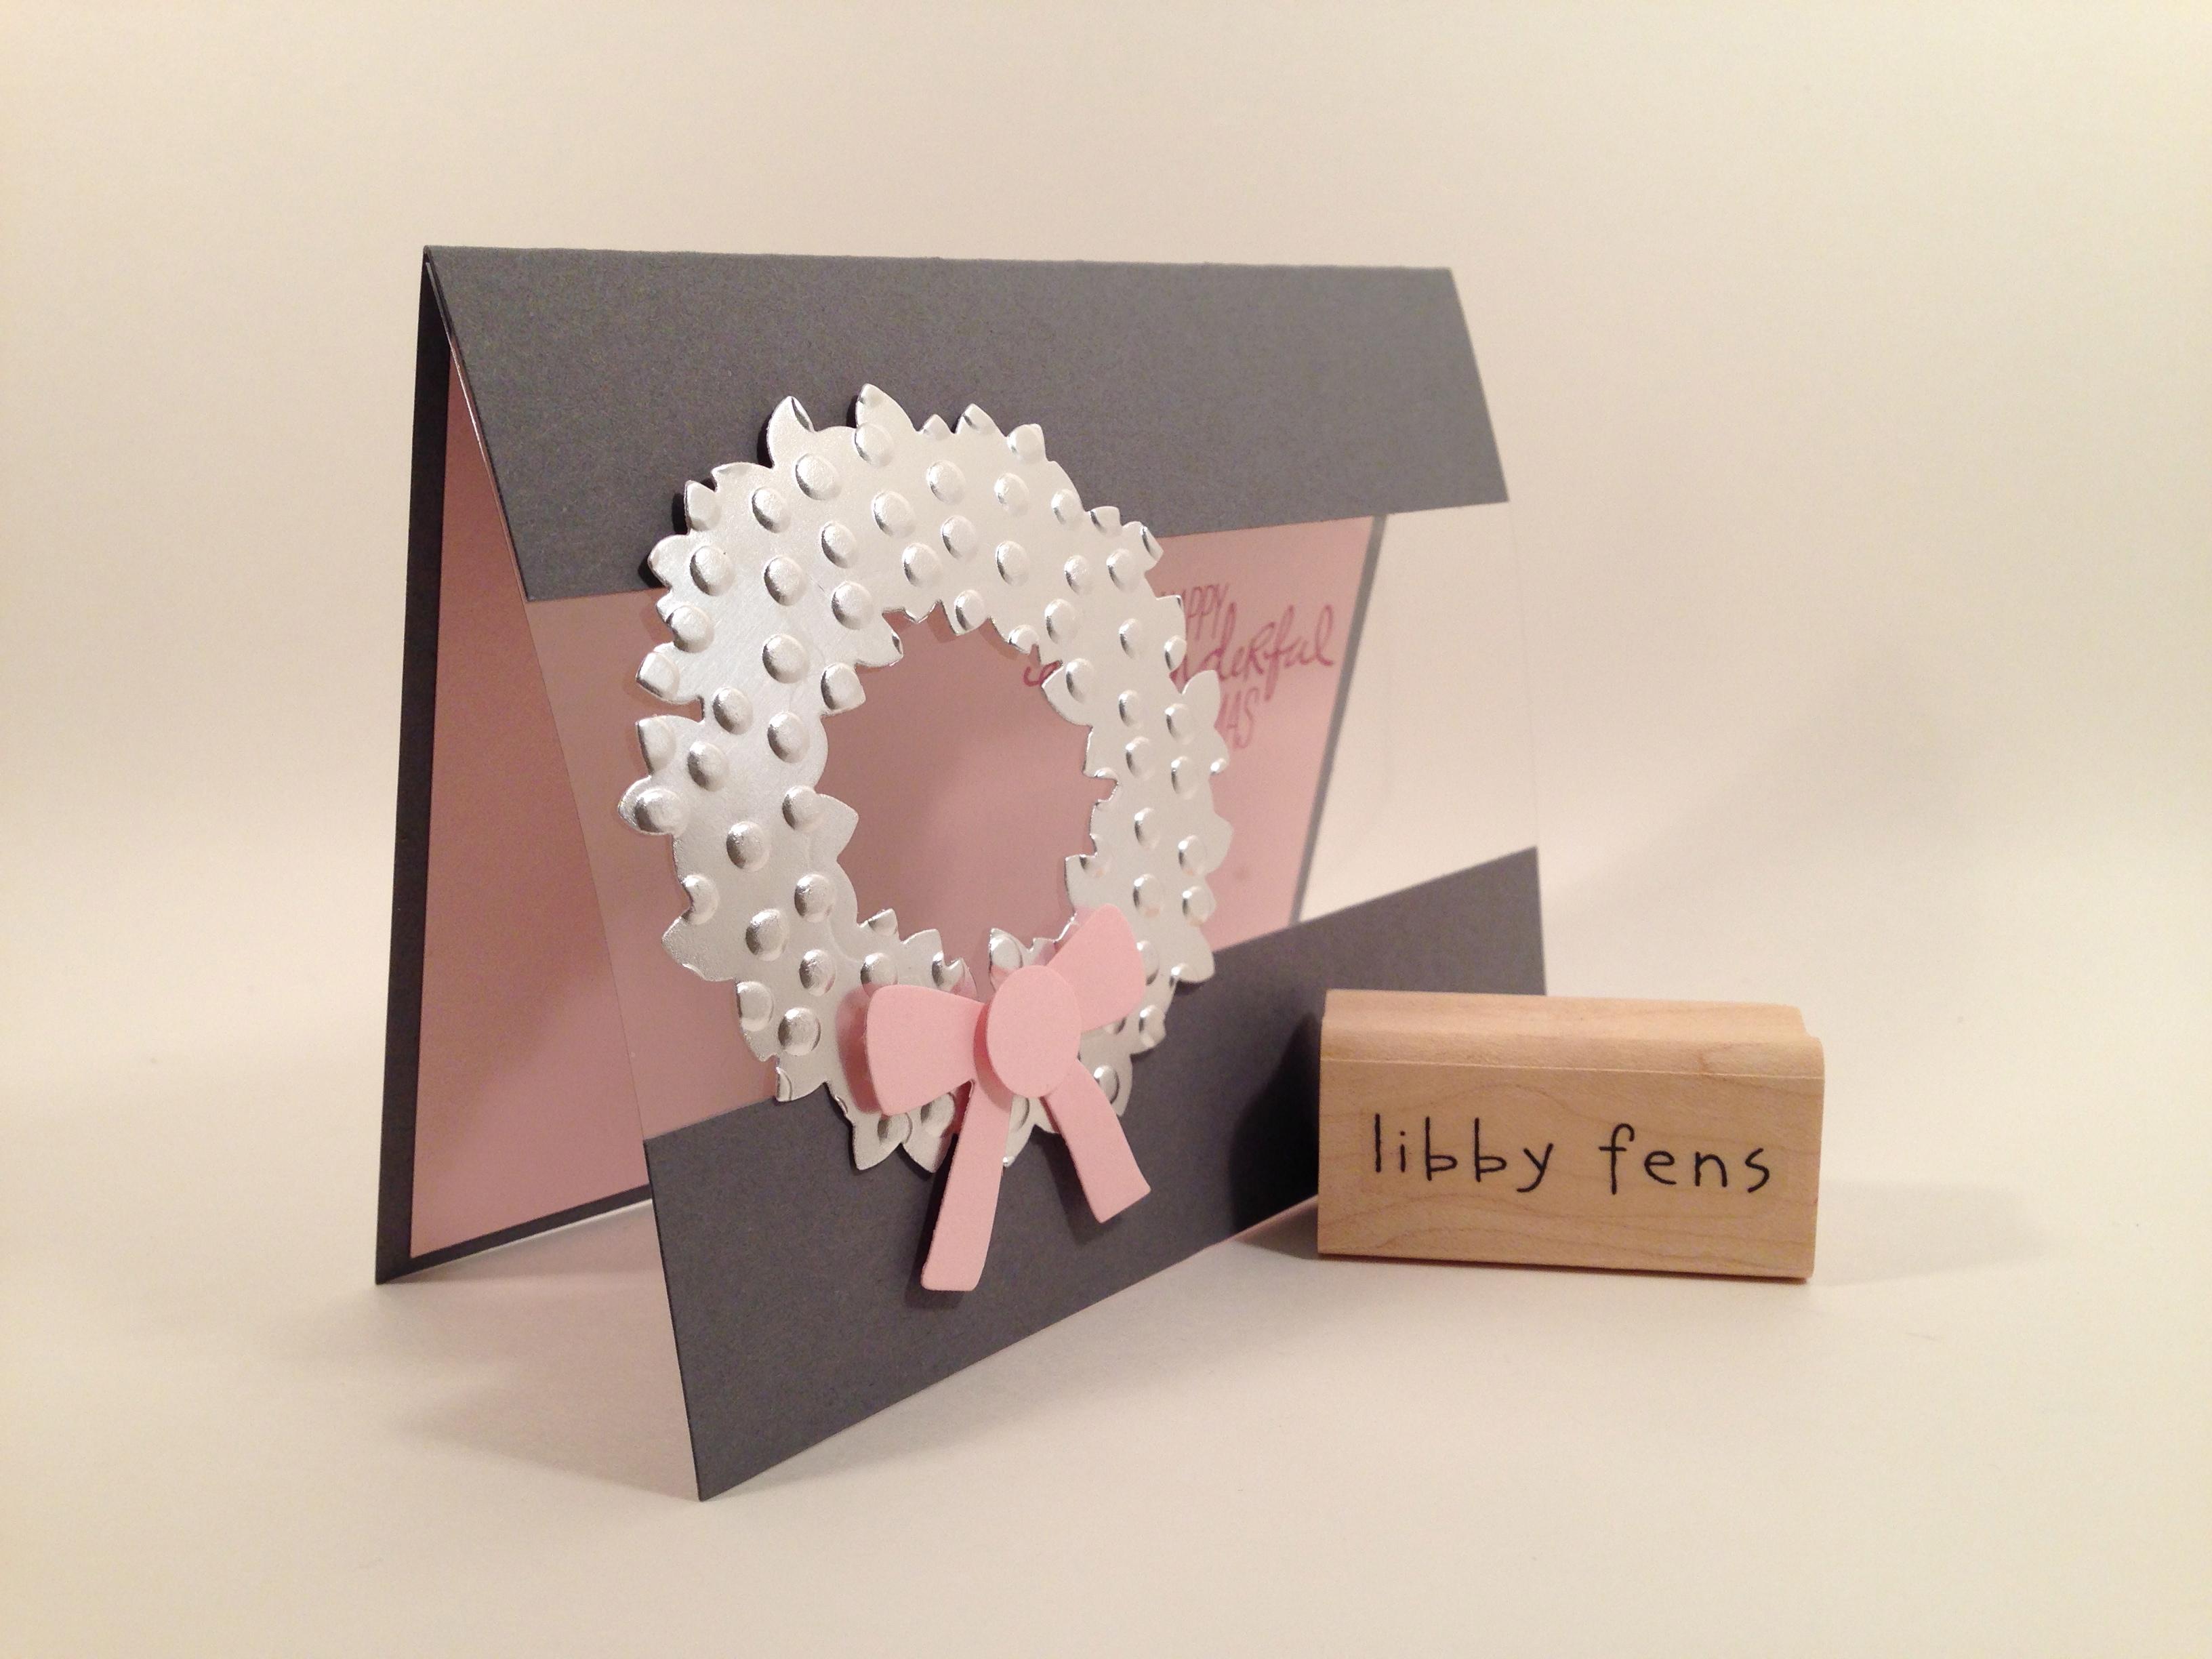 libbystamps, Wondrous Wreath Stamp Set, Wondrous Wreath Framelits, Silver Foil Sheets, Window Sheets, Decorative Dots Embossing Folder, 1/2 Circle Punch, Christmas, Window Sheet Card